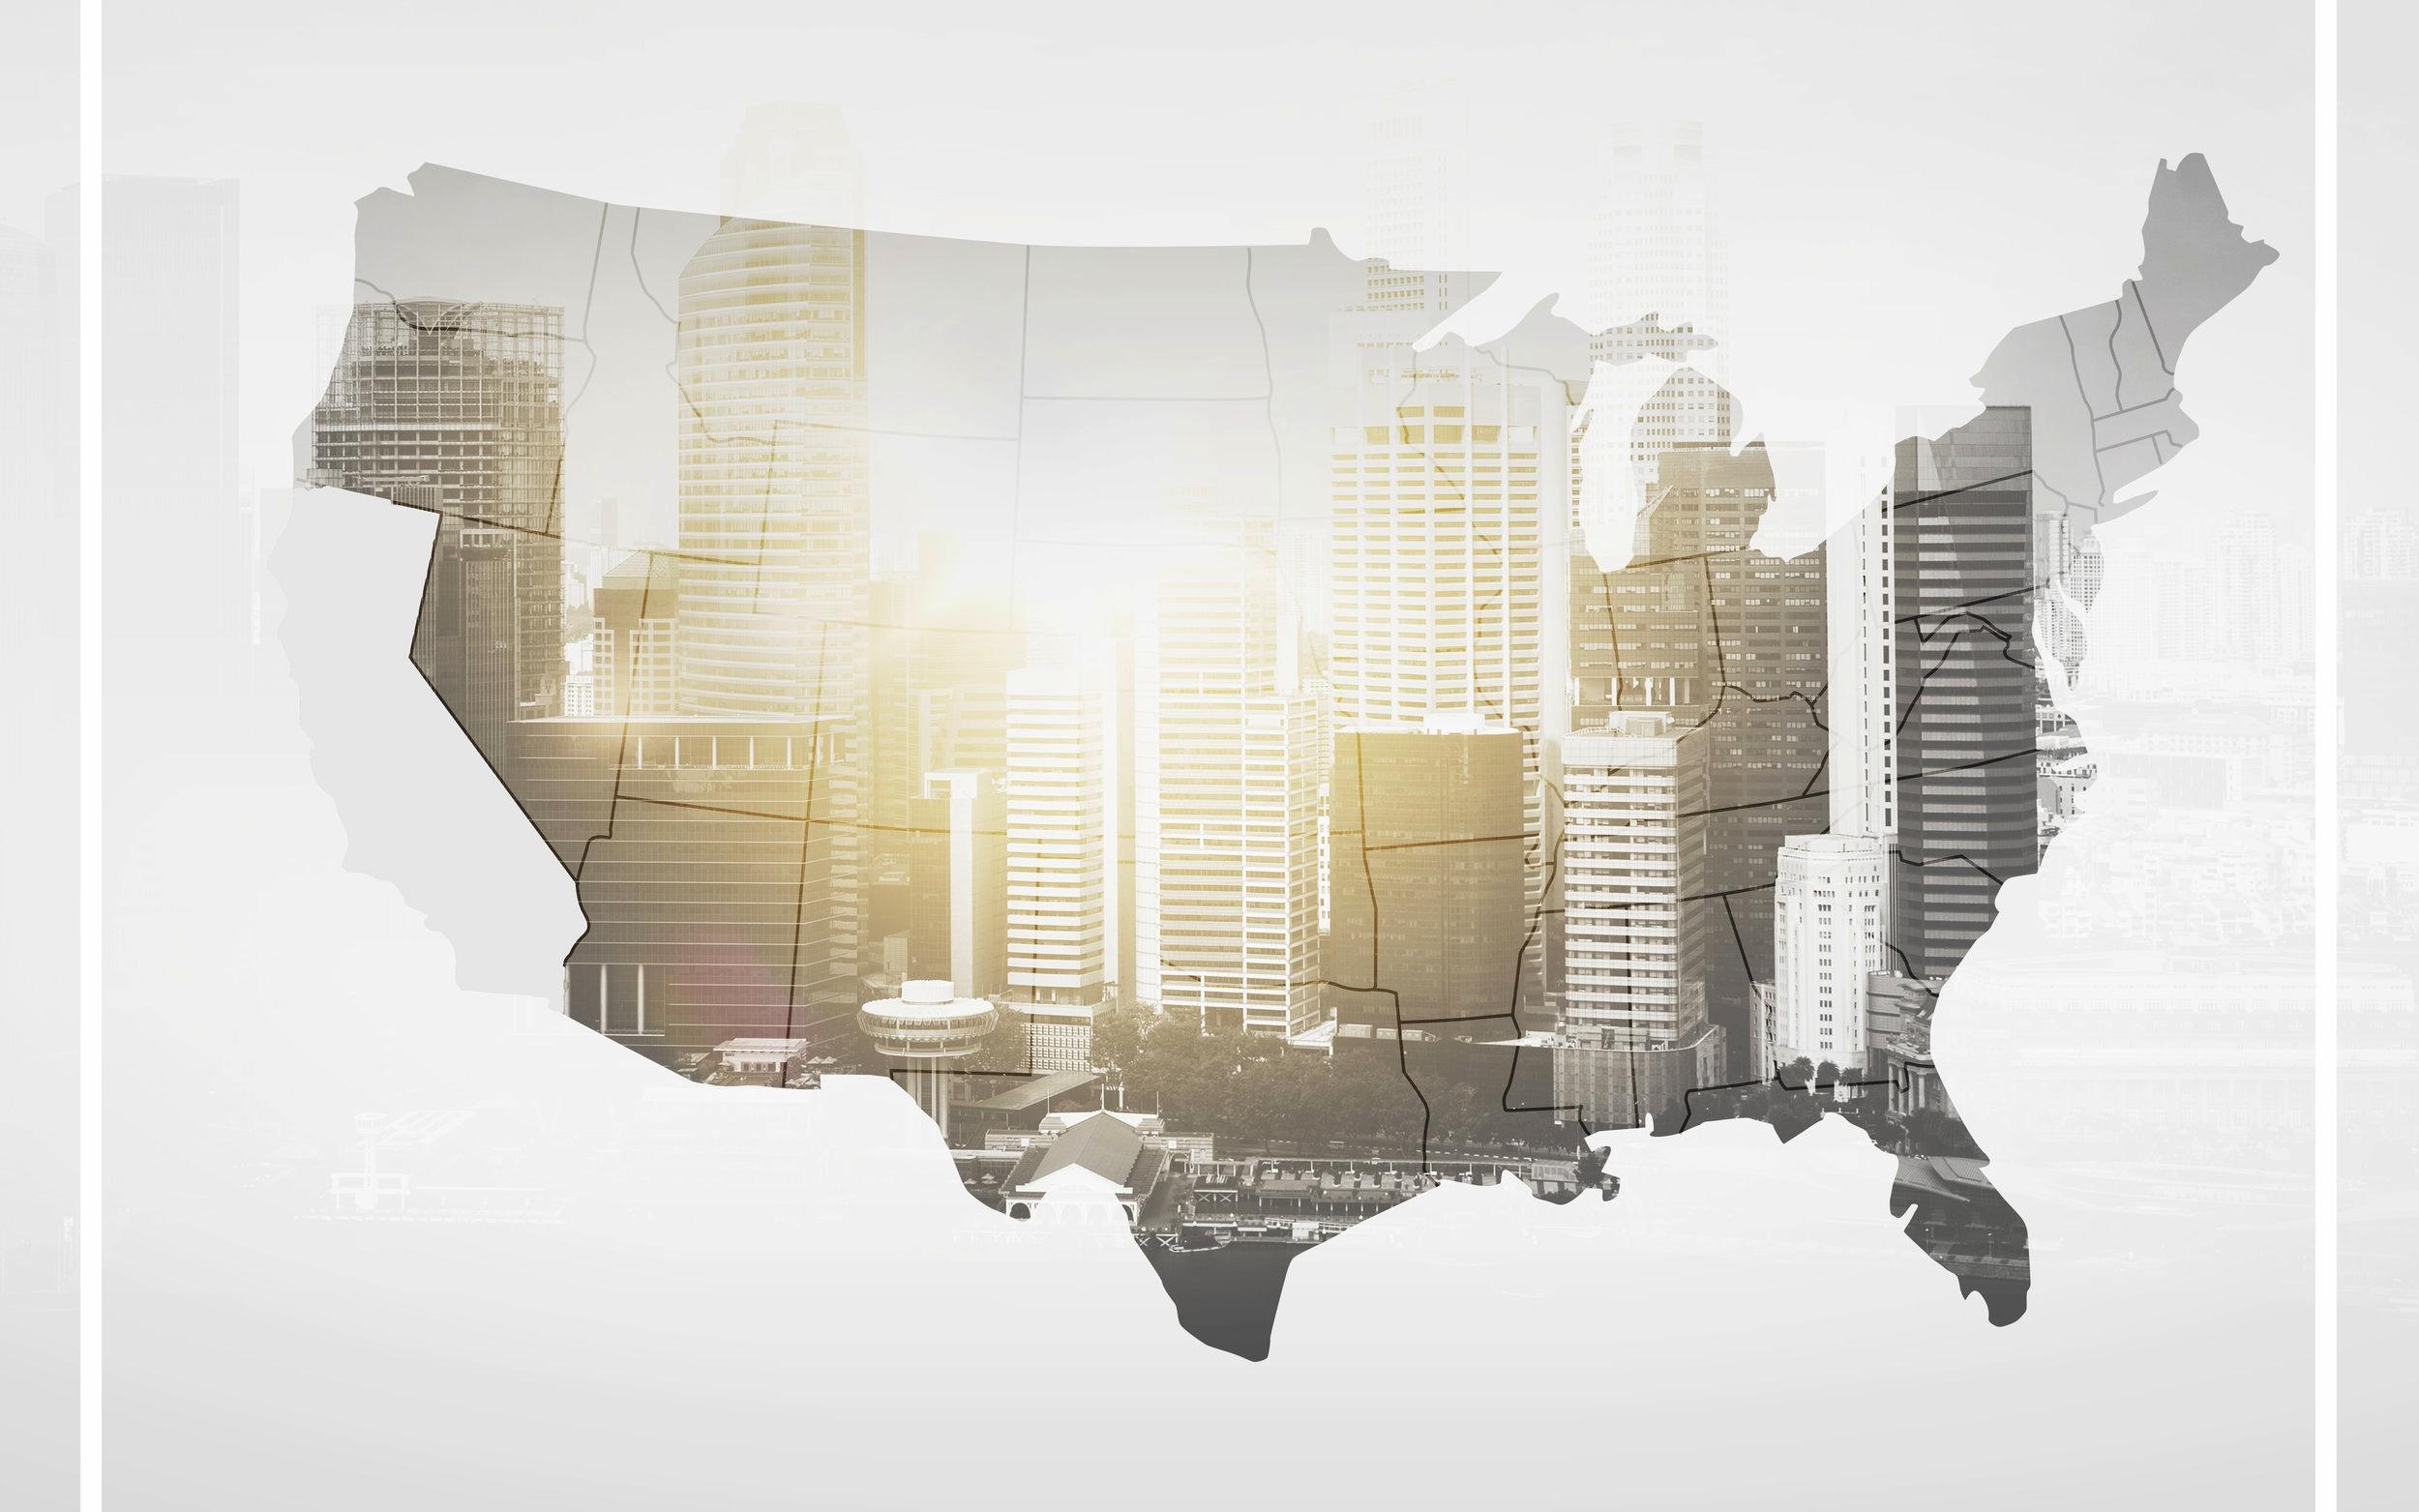 Truckload & LTL - Covering 47 states